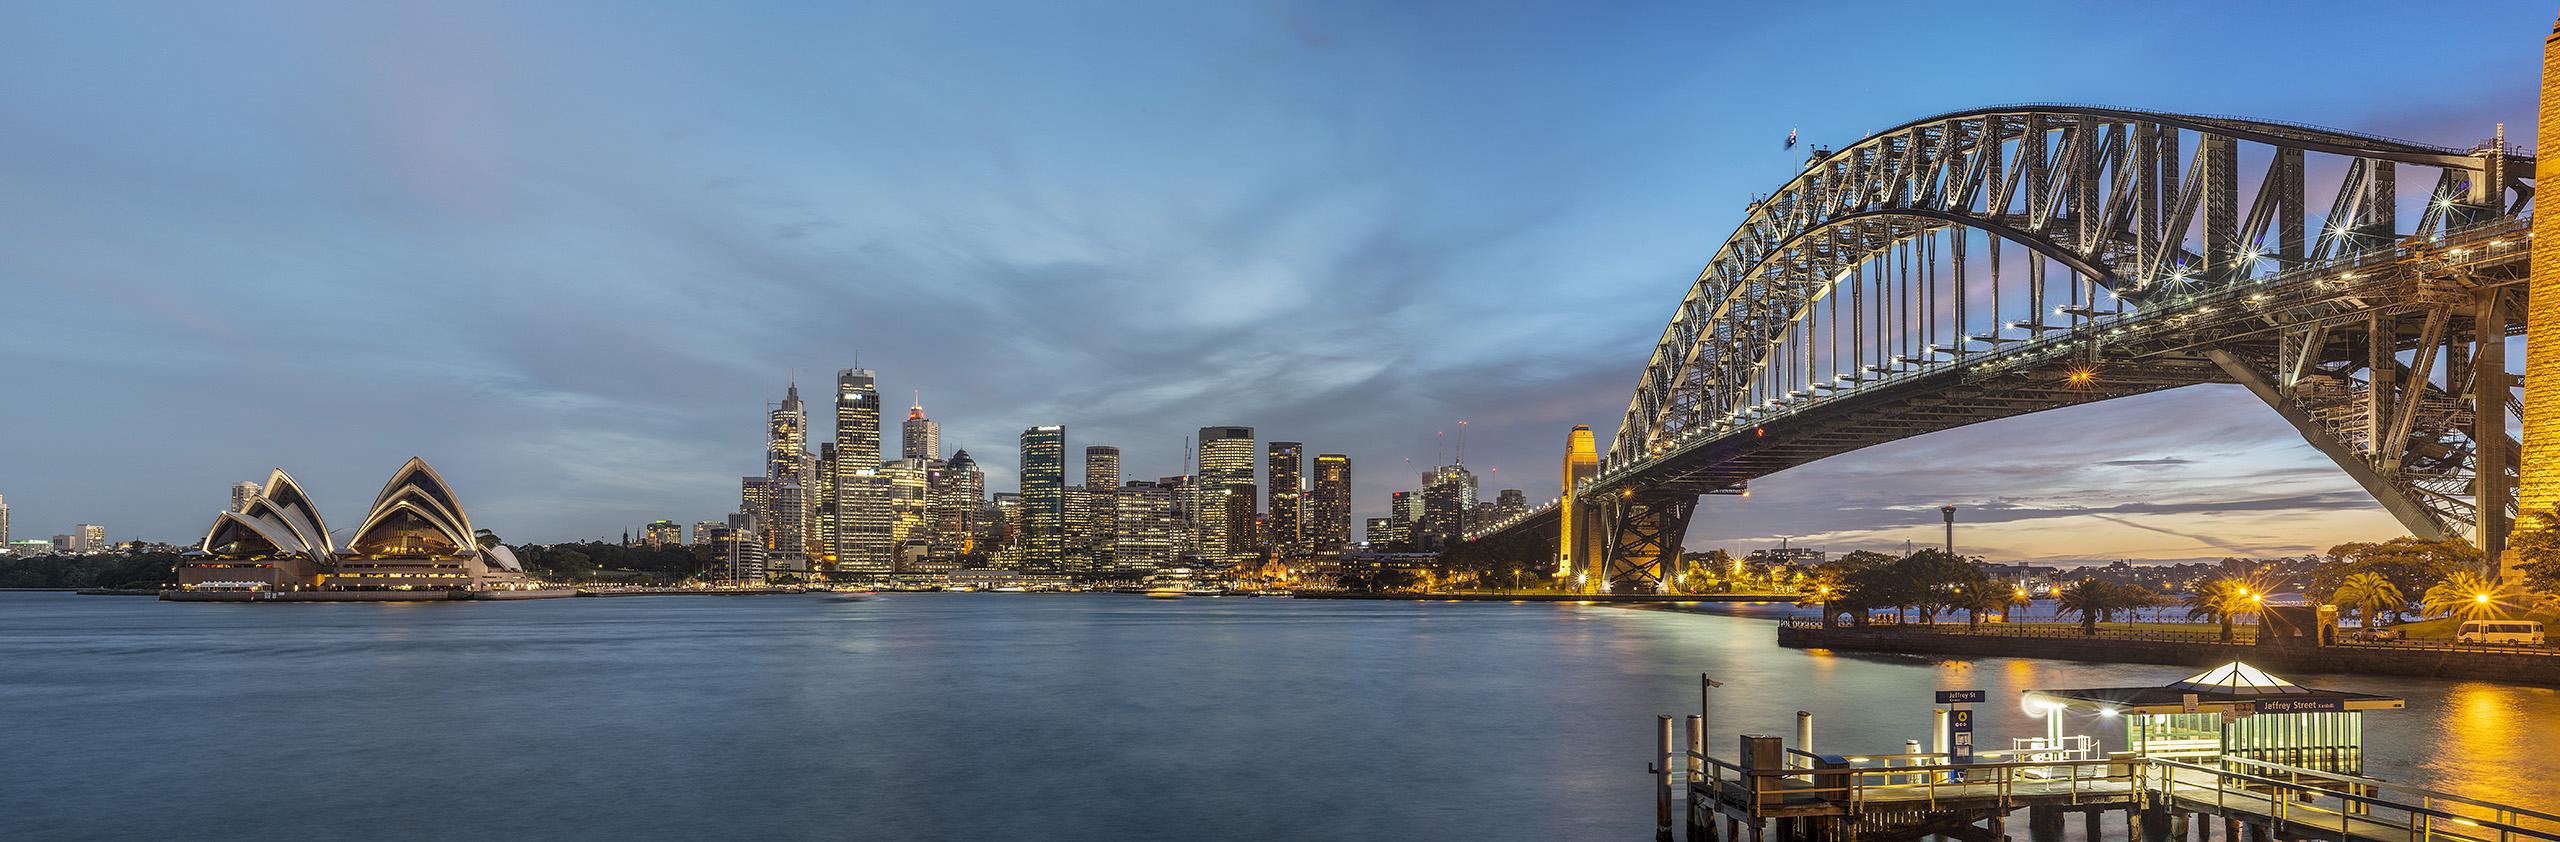 Sydny_Skyline_panorama06b_2560.jpg